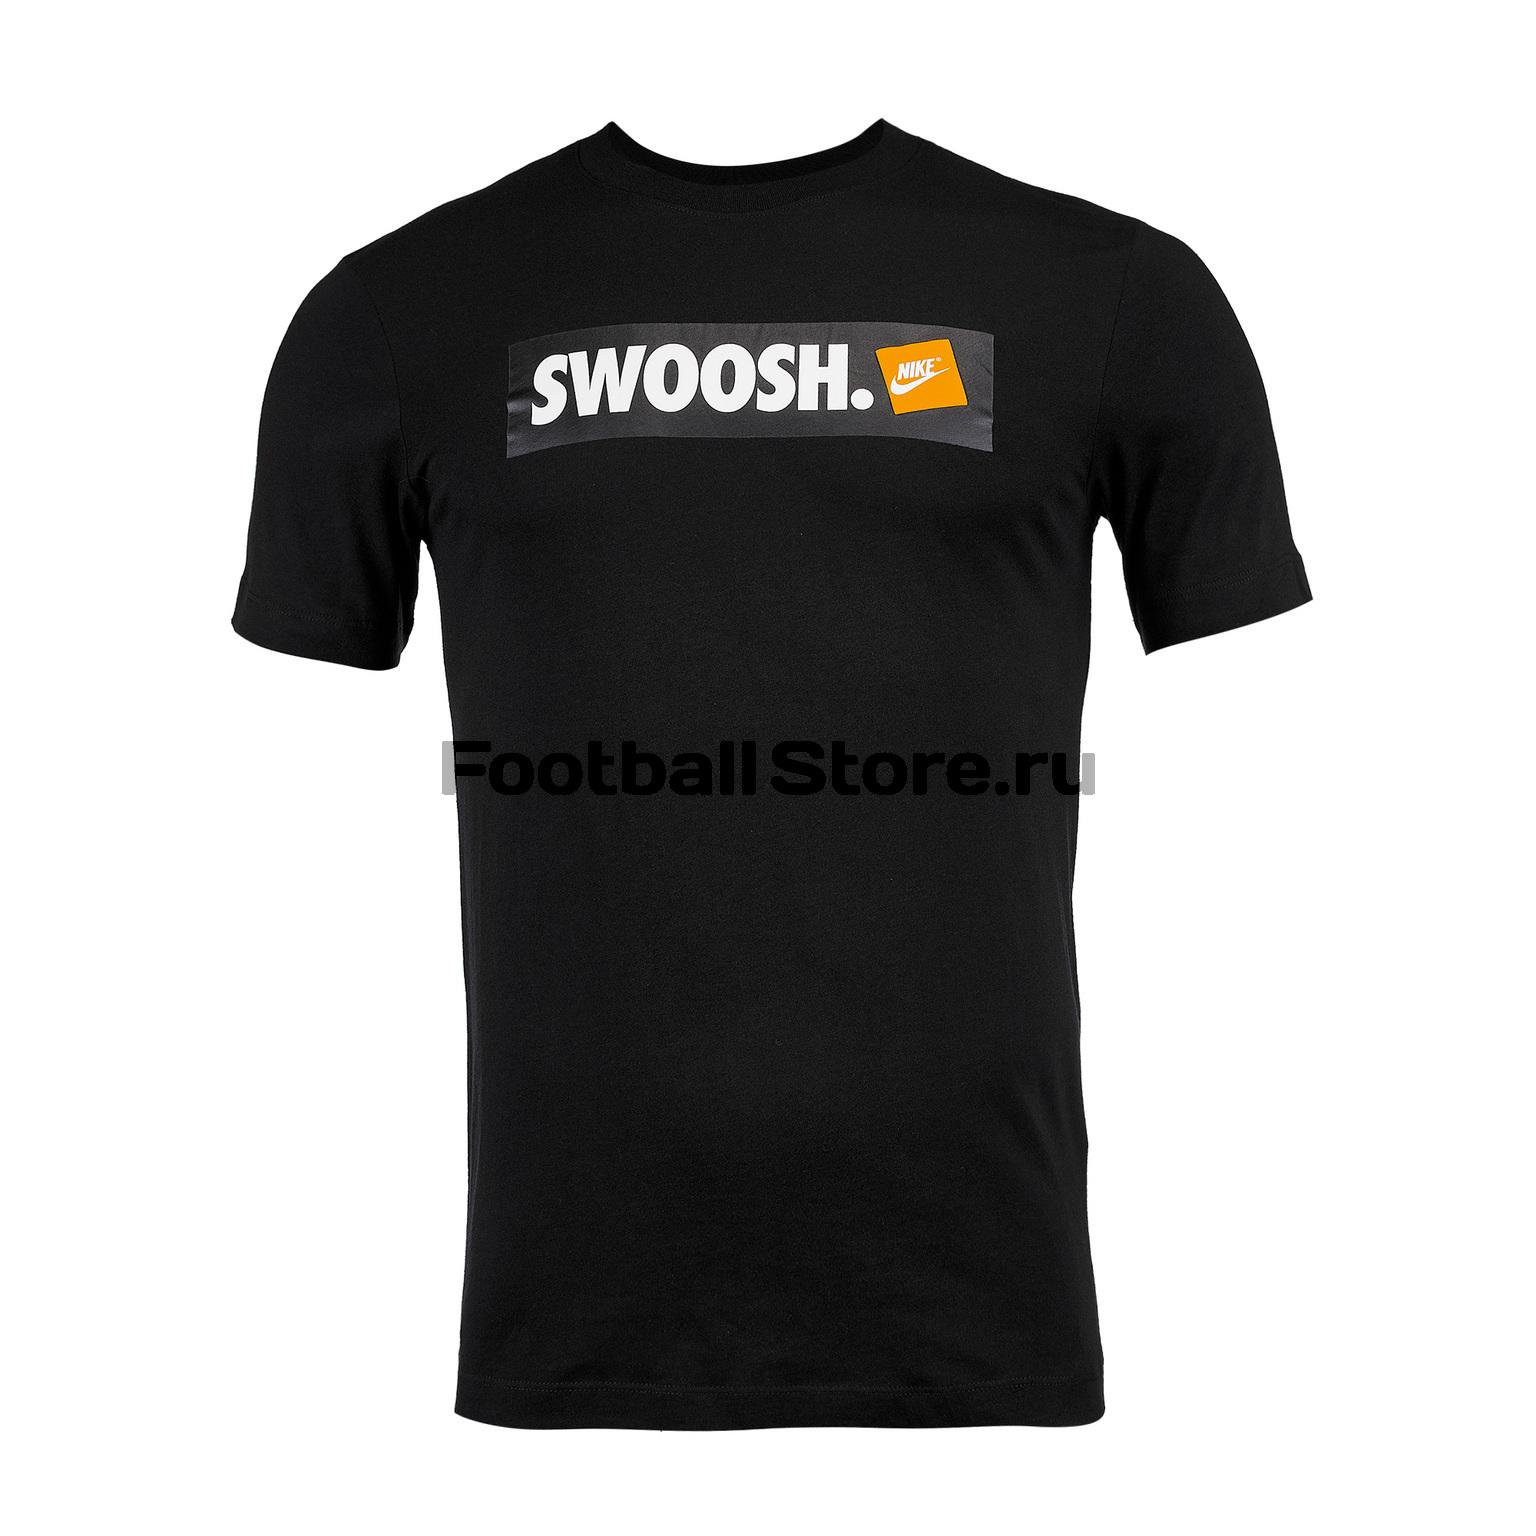 Футболка хлопковая Nike Tee Swoosh AR5027-010 футболка хлопковая nike tee club19 ss aj1504 451